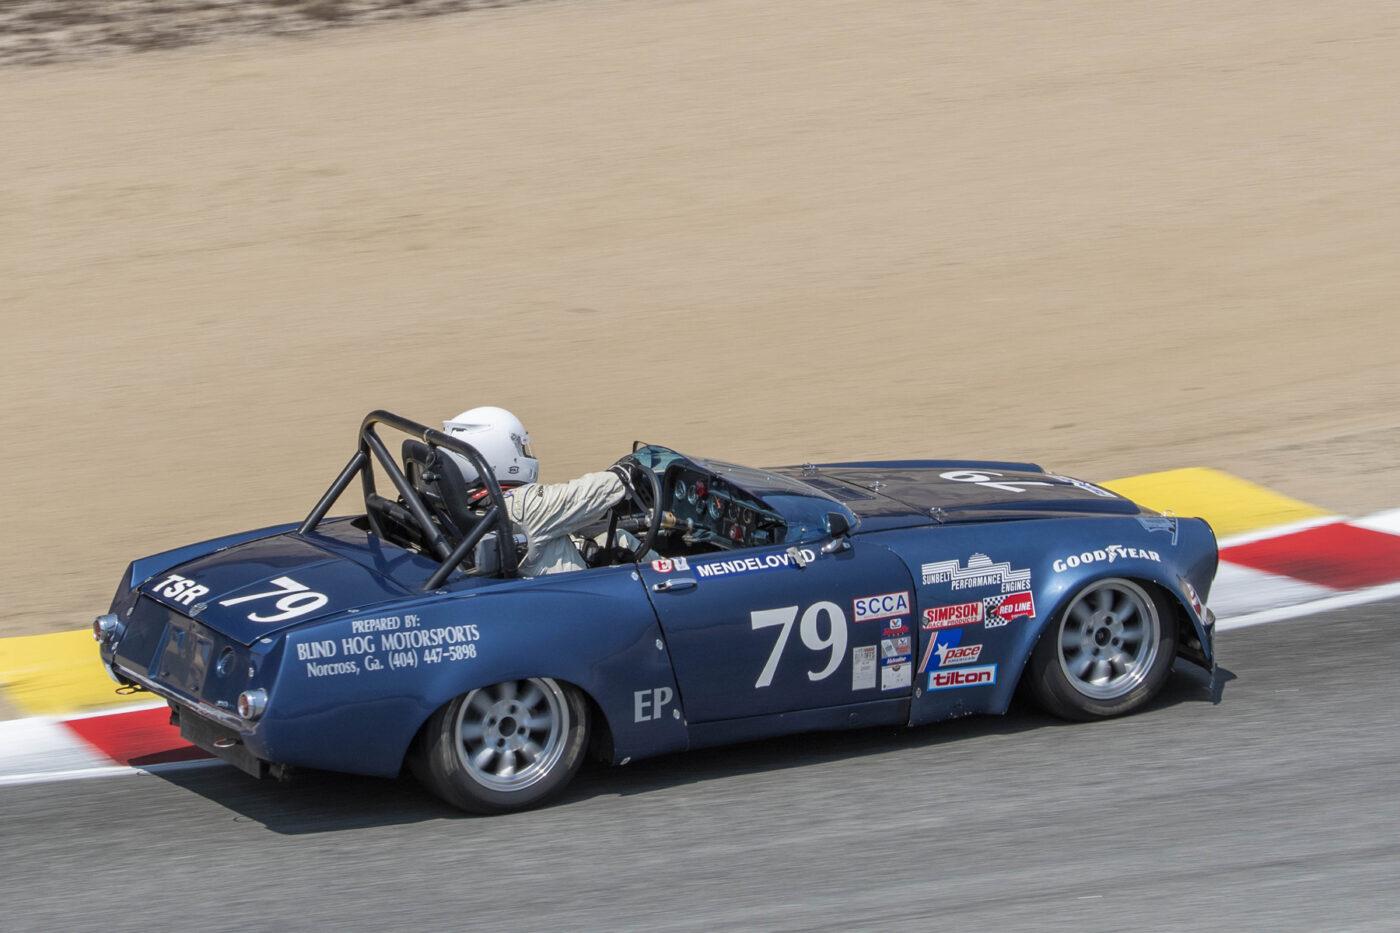 Group 2: 1961-1966 GT under 2500cc - Philip Mendelovitz exiting turn 6 in his 1967 Datsun 311 2000 Roadster - ©Rex McAfee